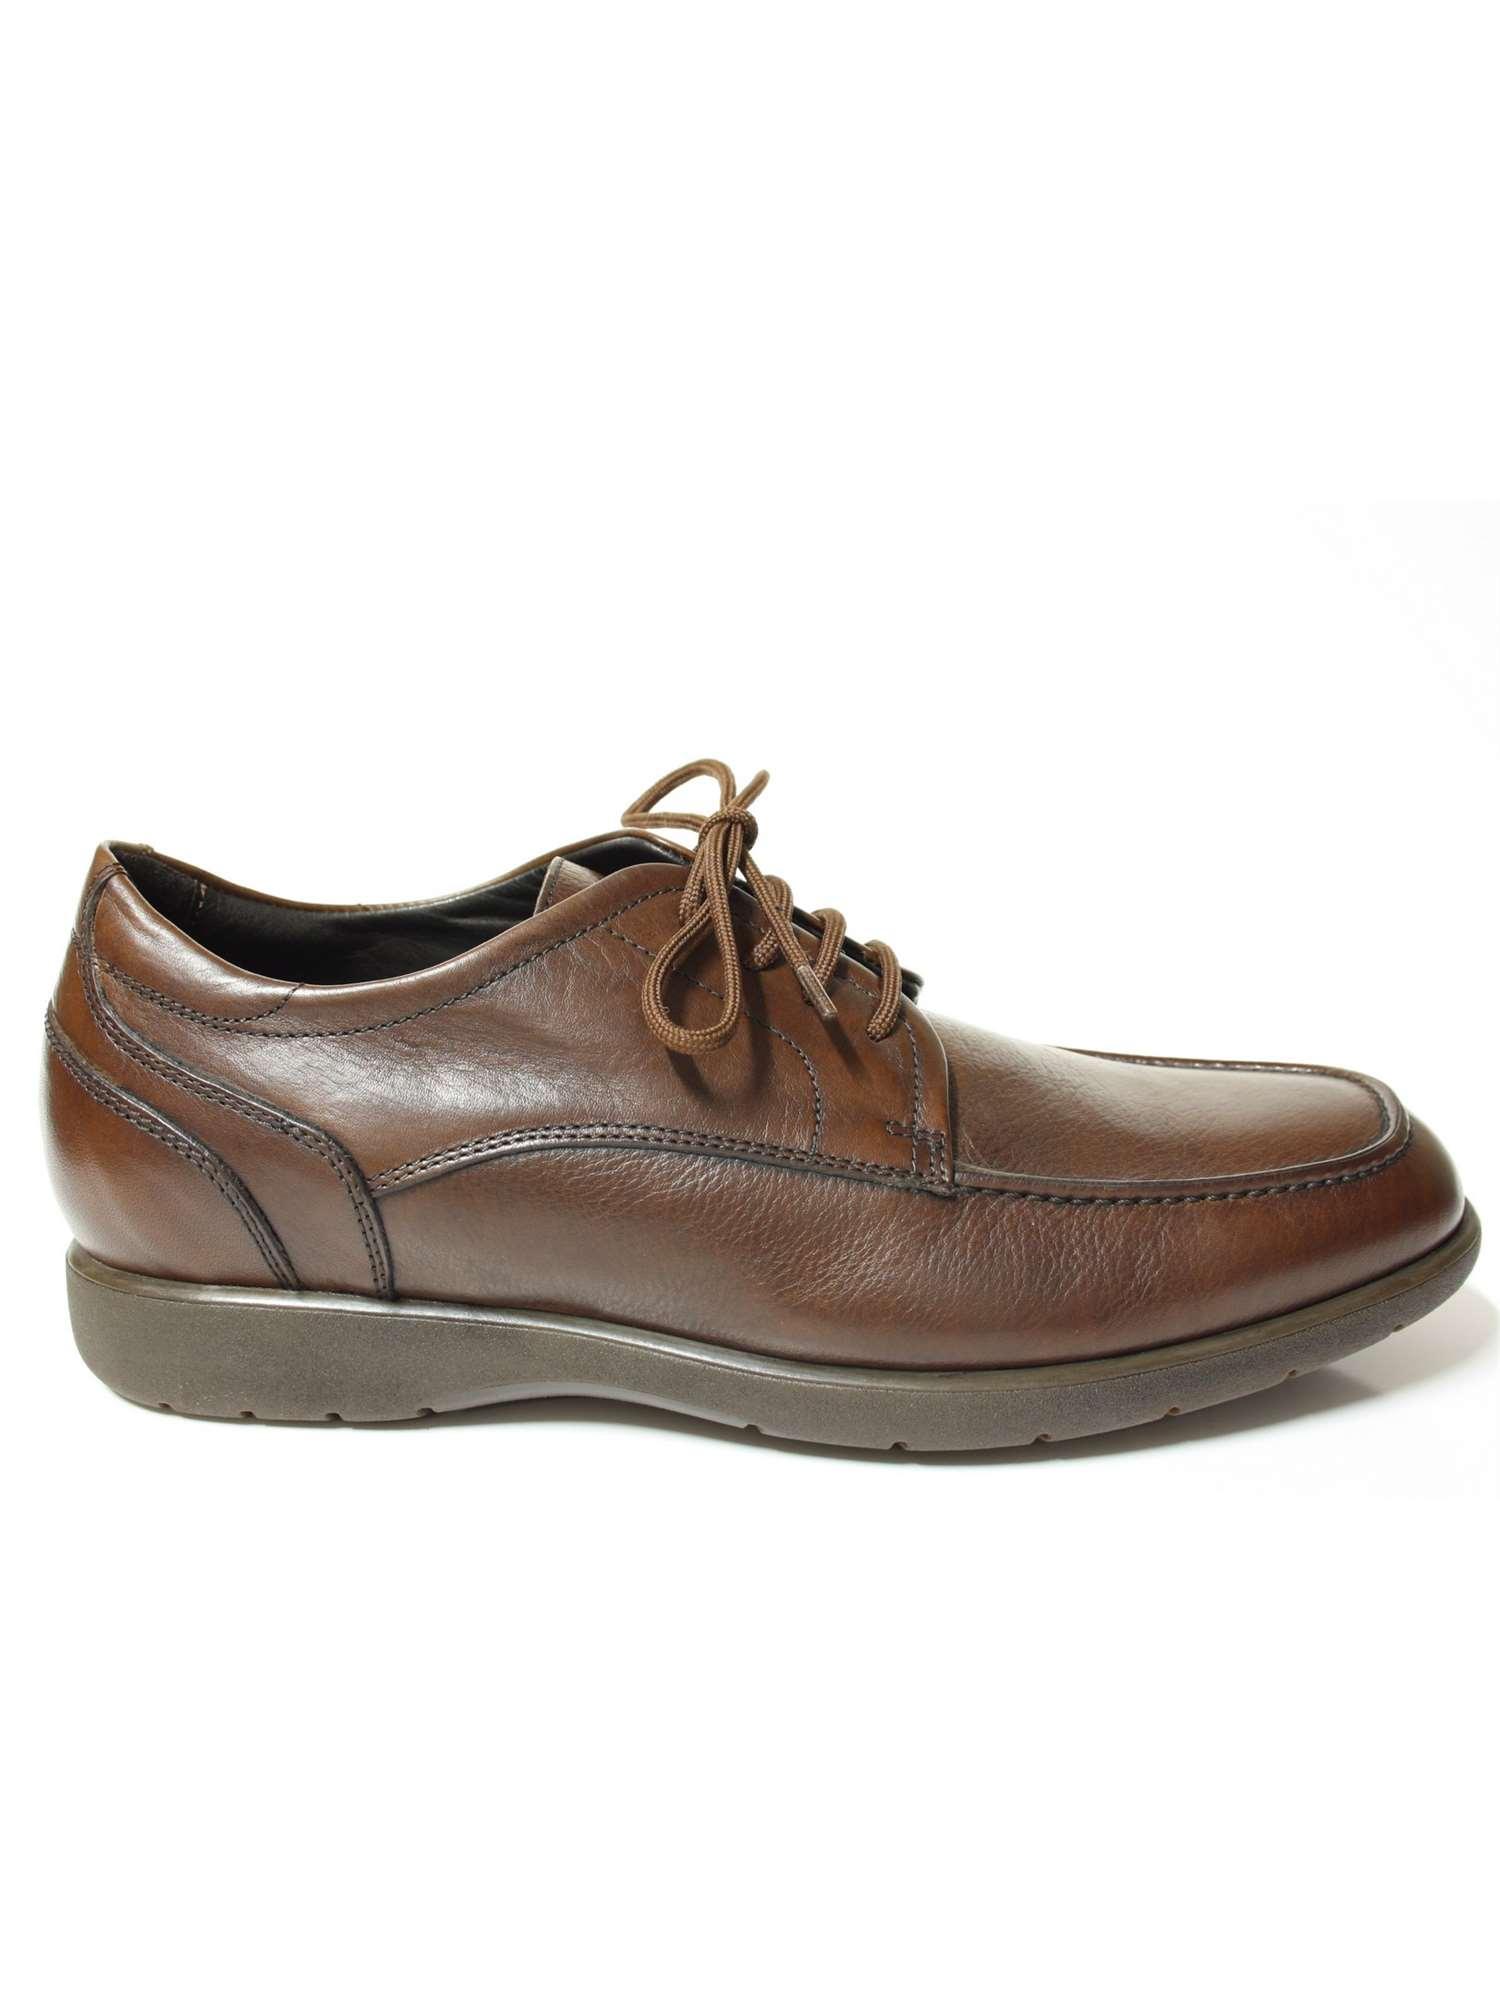 Lion Shoes 10600 Marron Scarpe Uomo 0cd9d8e3985